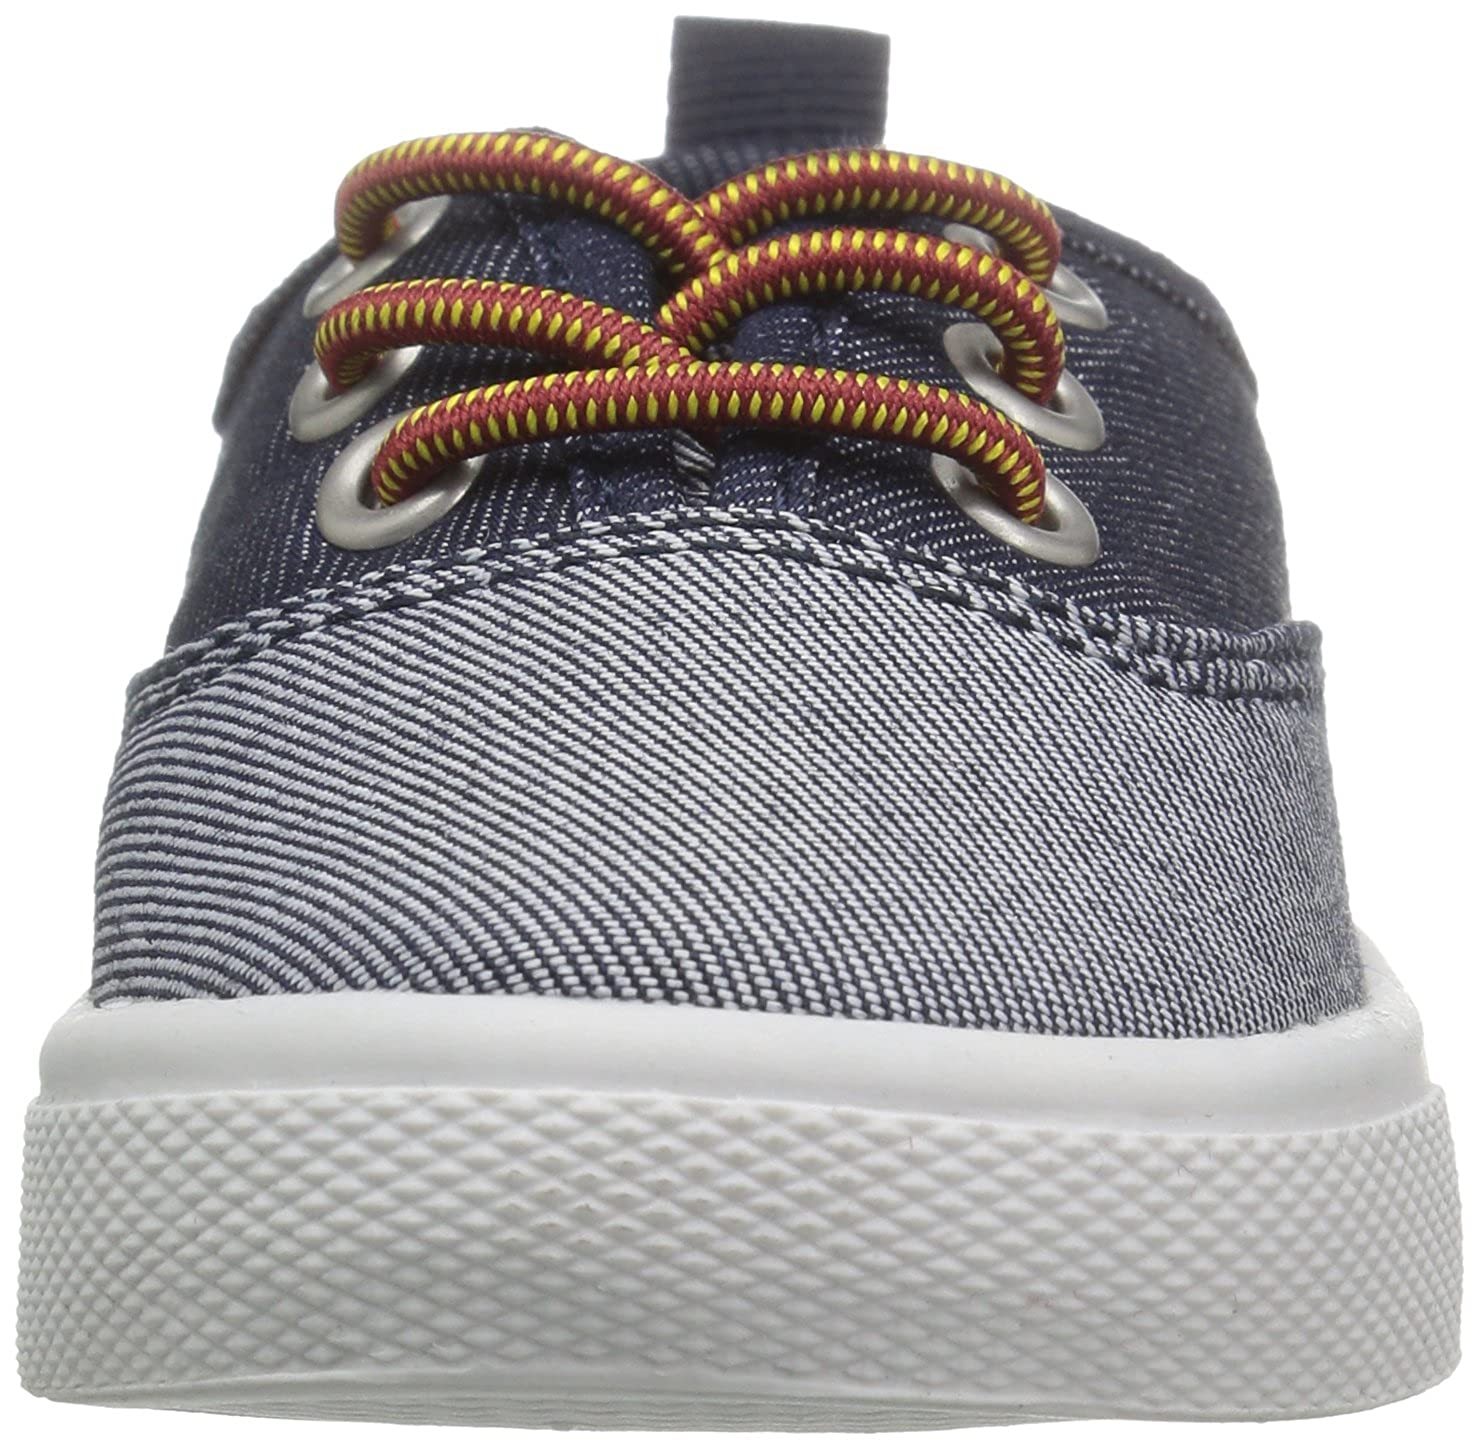 Carters Kids Maximus Boys Casual Slip-On Sneaker